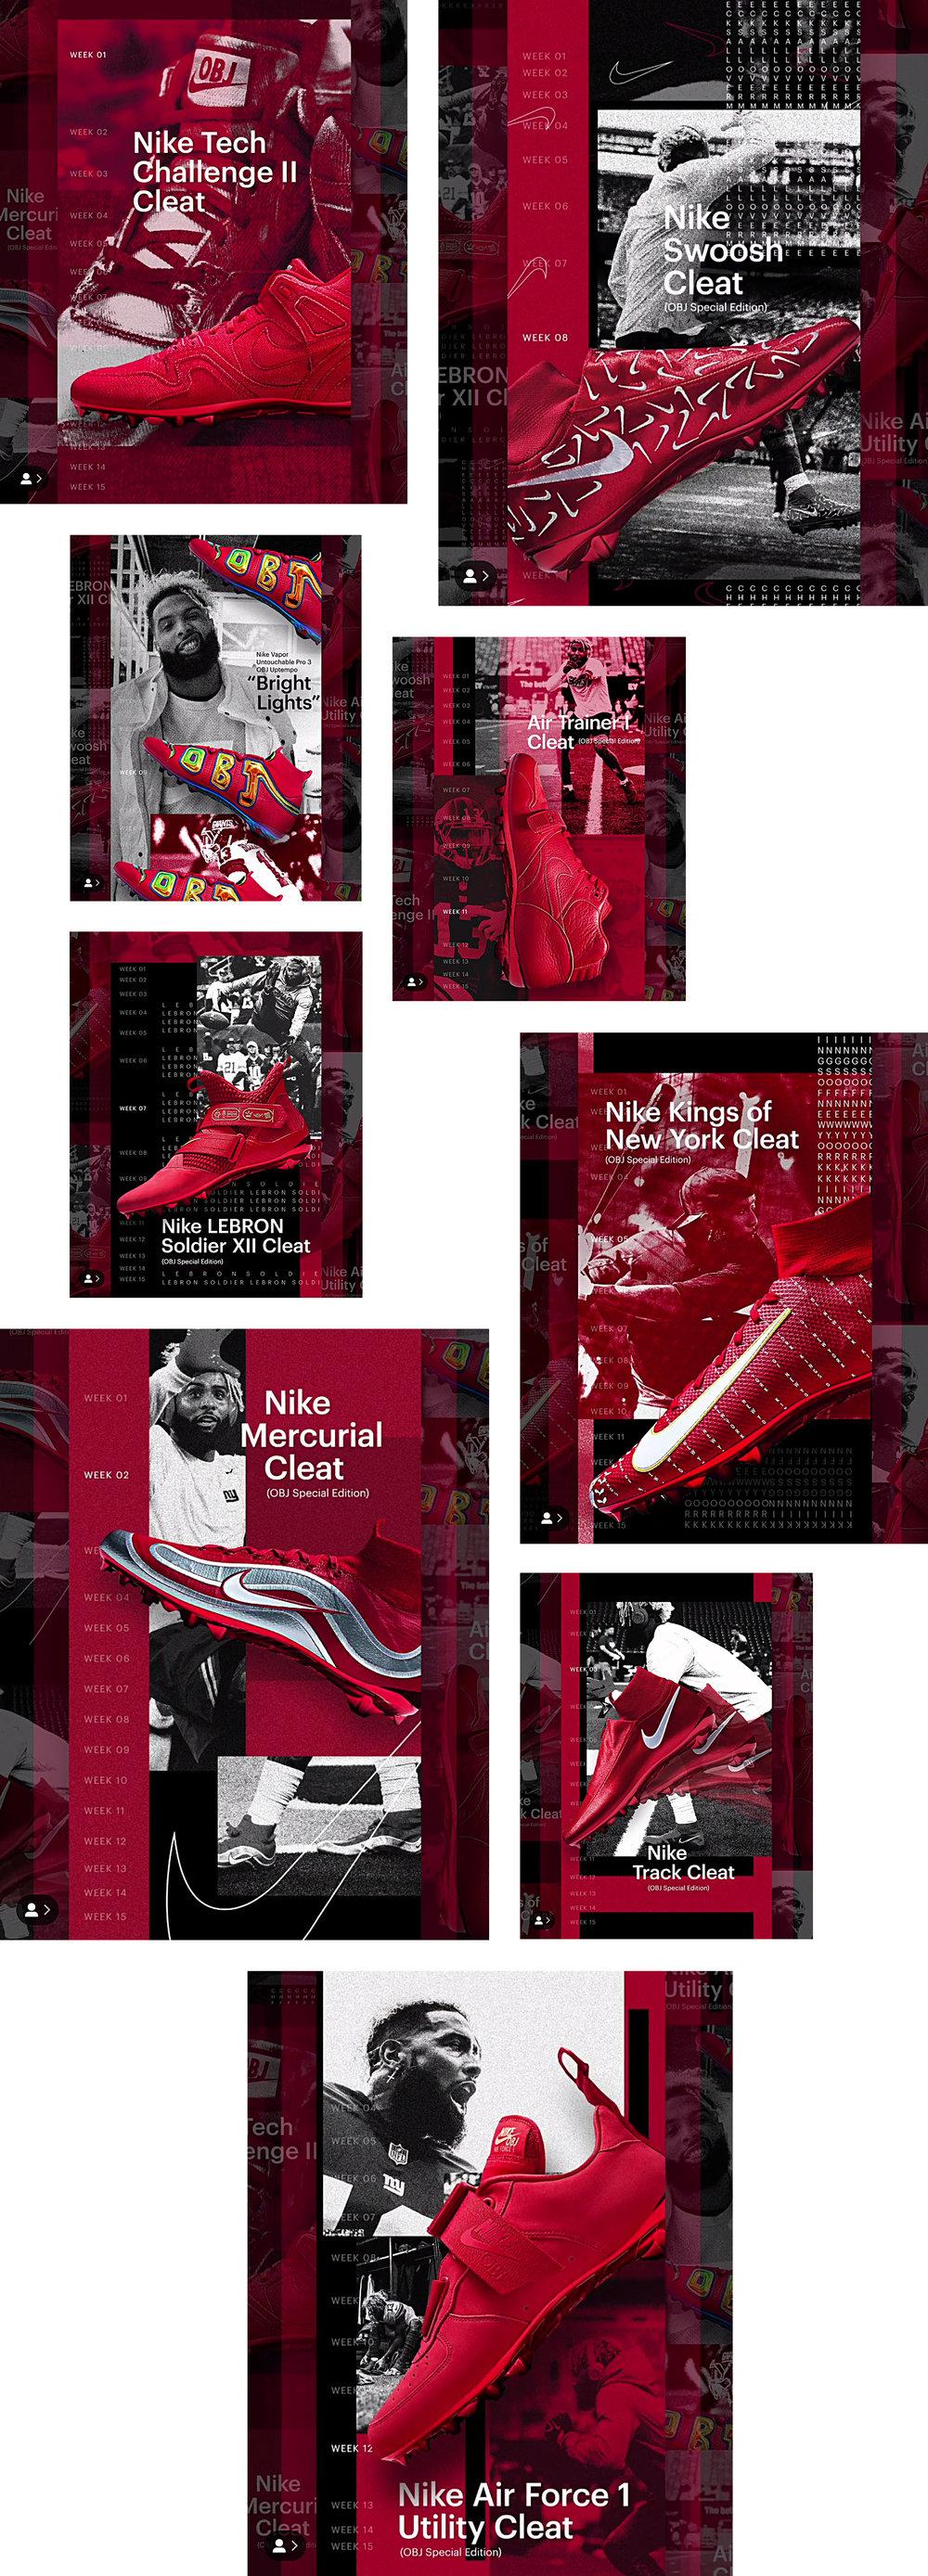 Nike_OBJ_cleat_social_posters_zilka.jpg